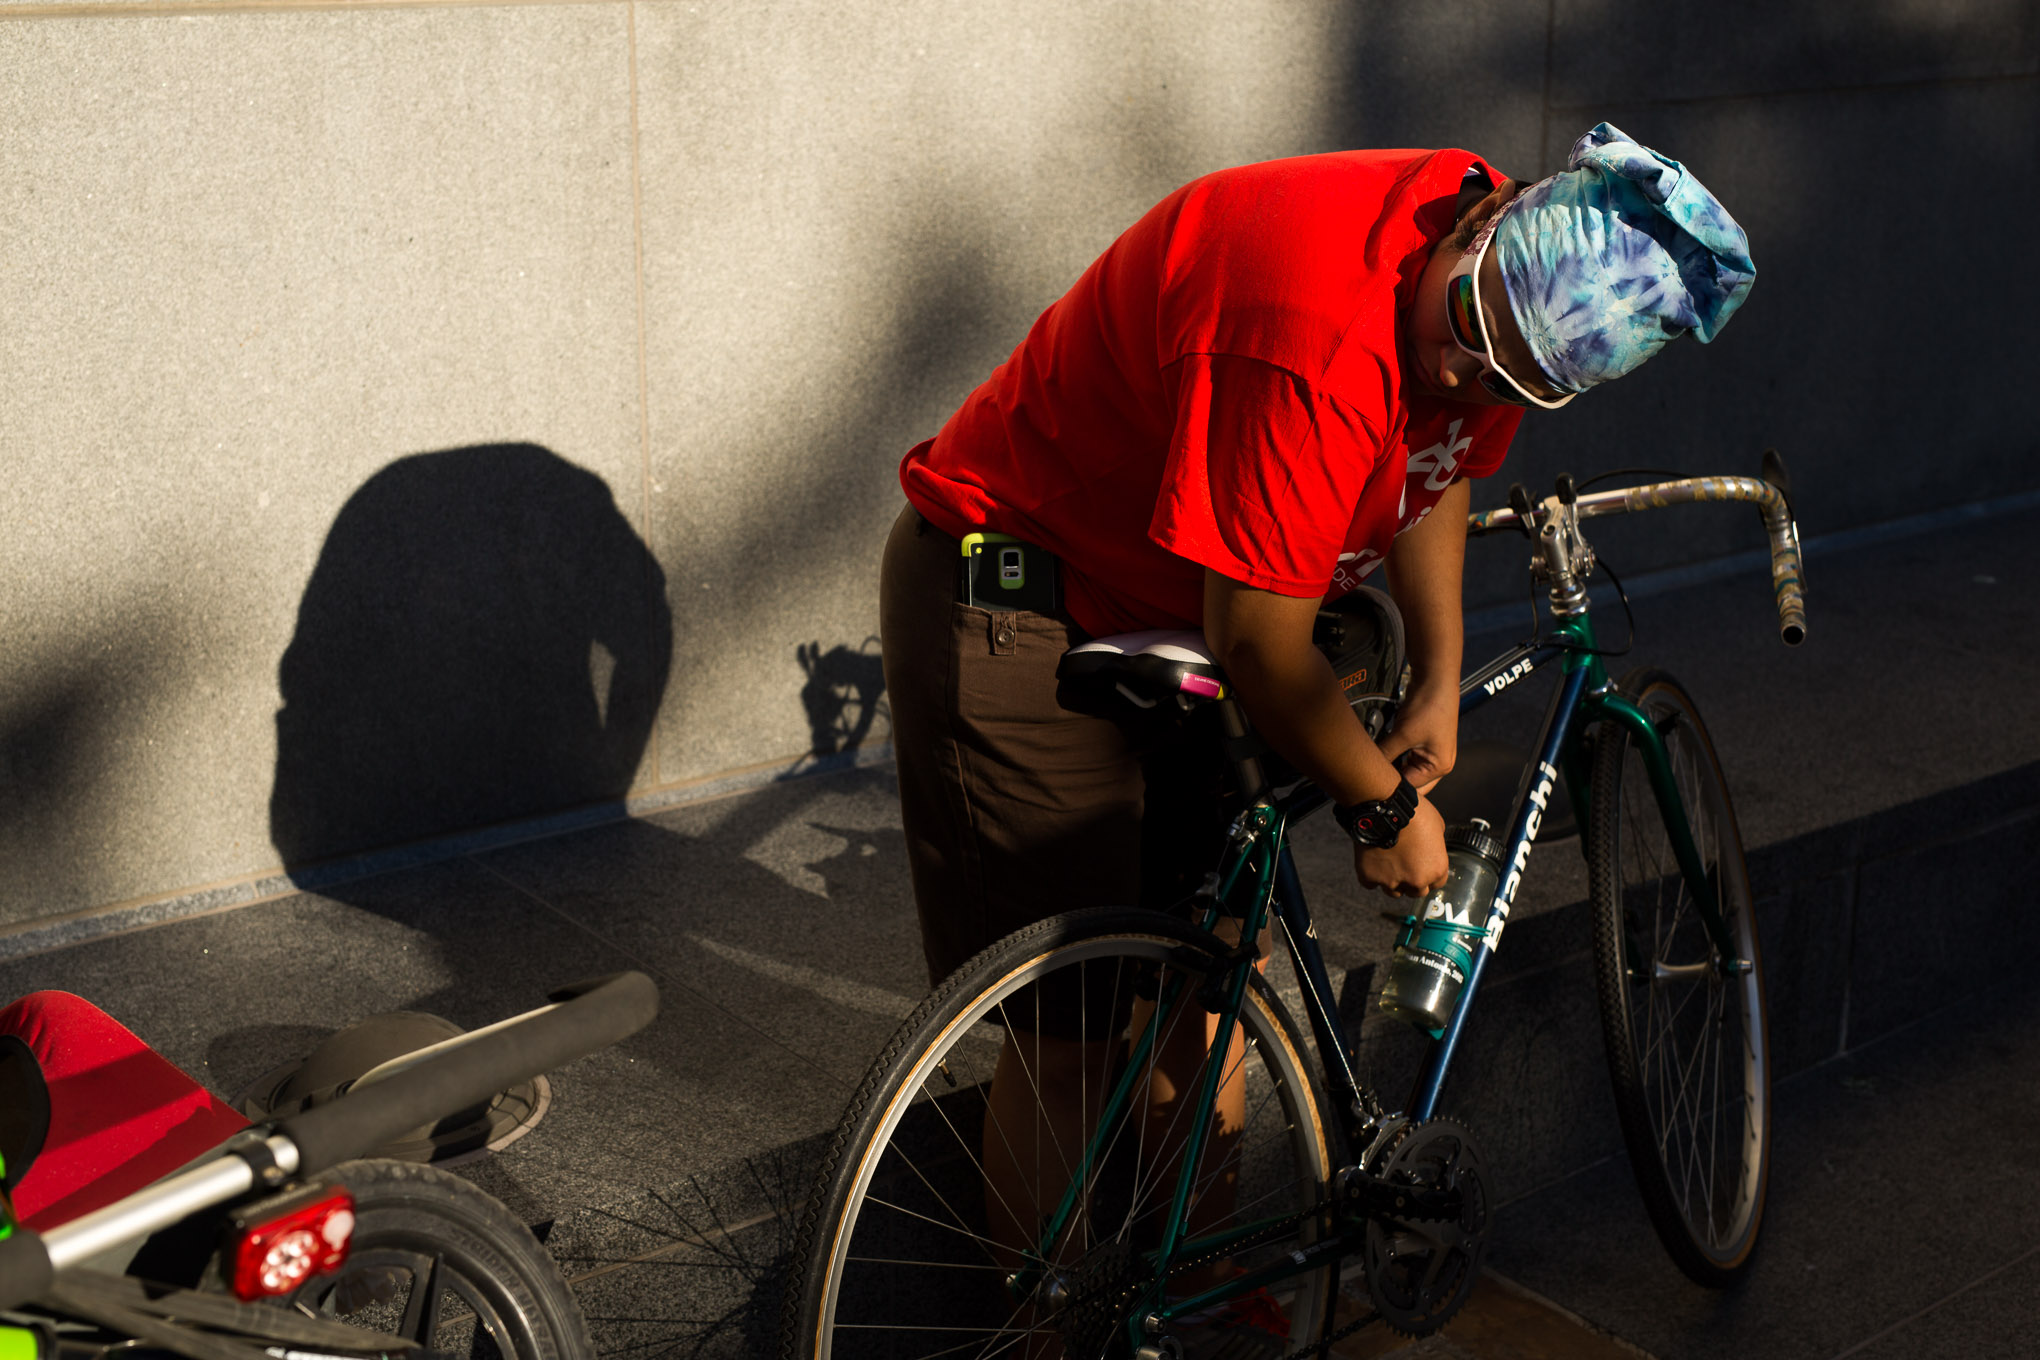 Earnabike supporter Natalie Alvarado locks her bike as she arrives to Main Plaza. Photo by Scott Ball.